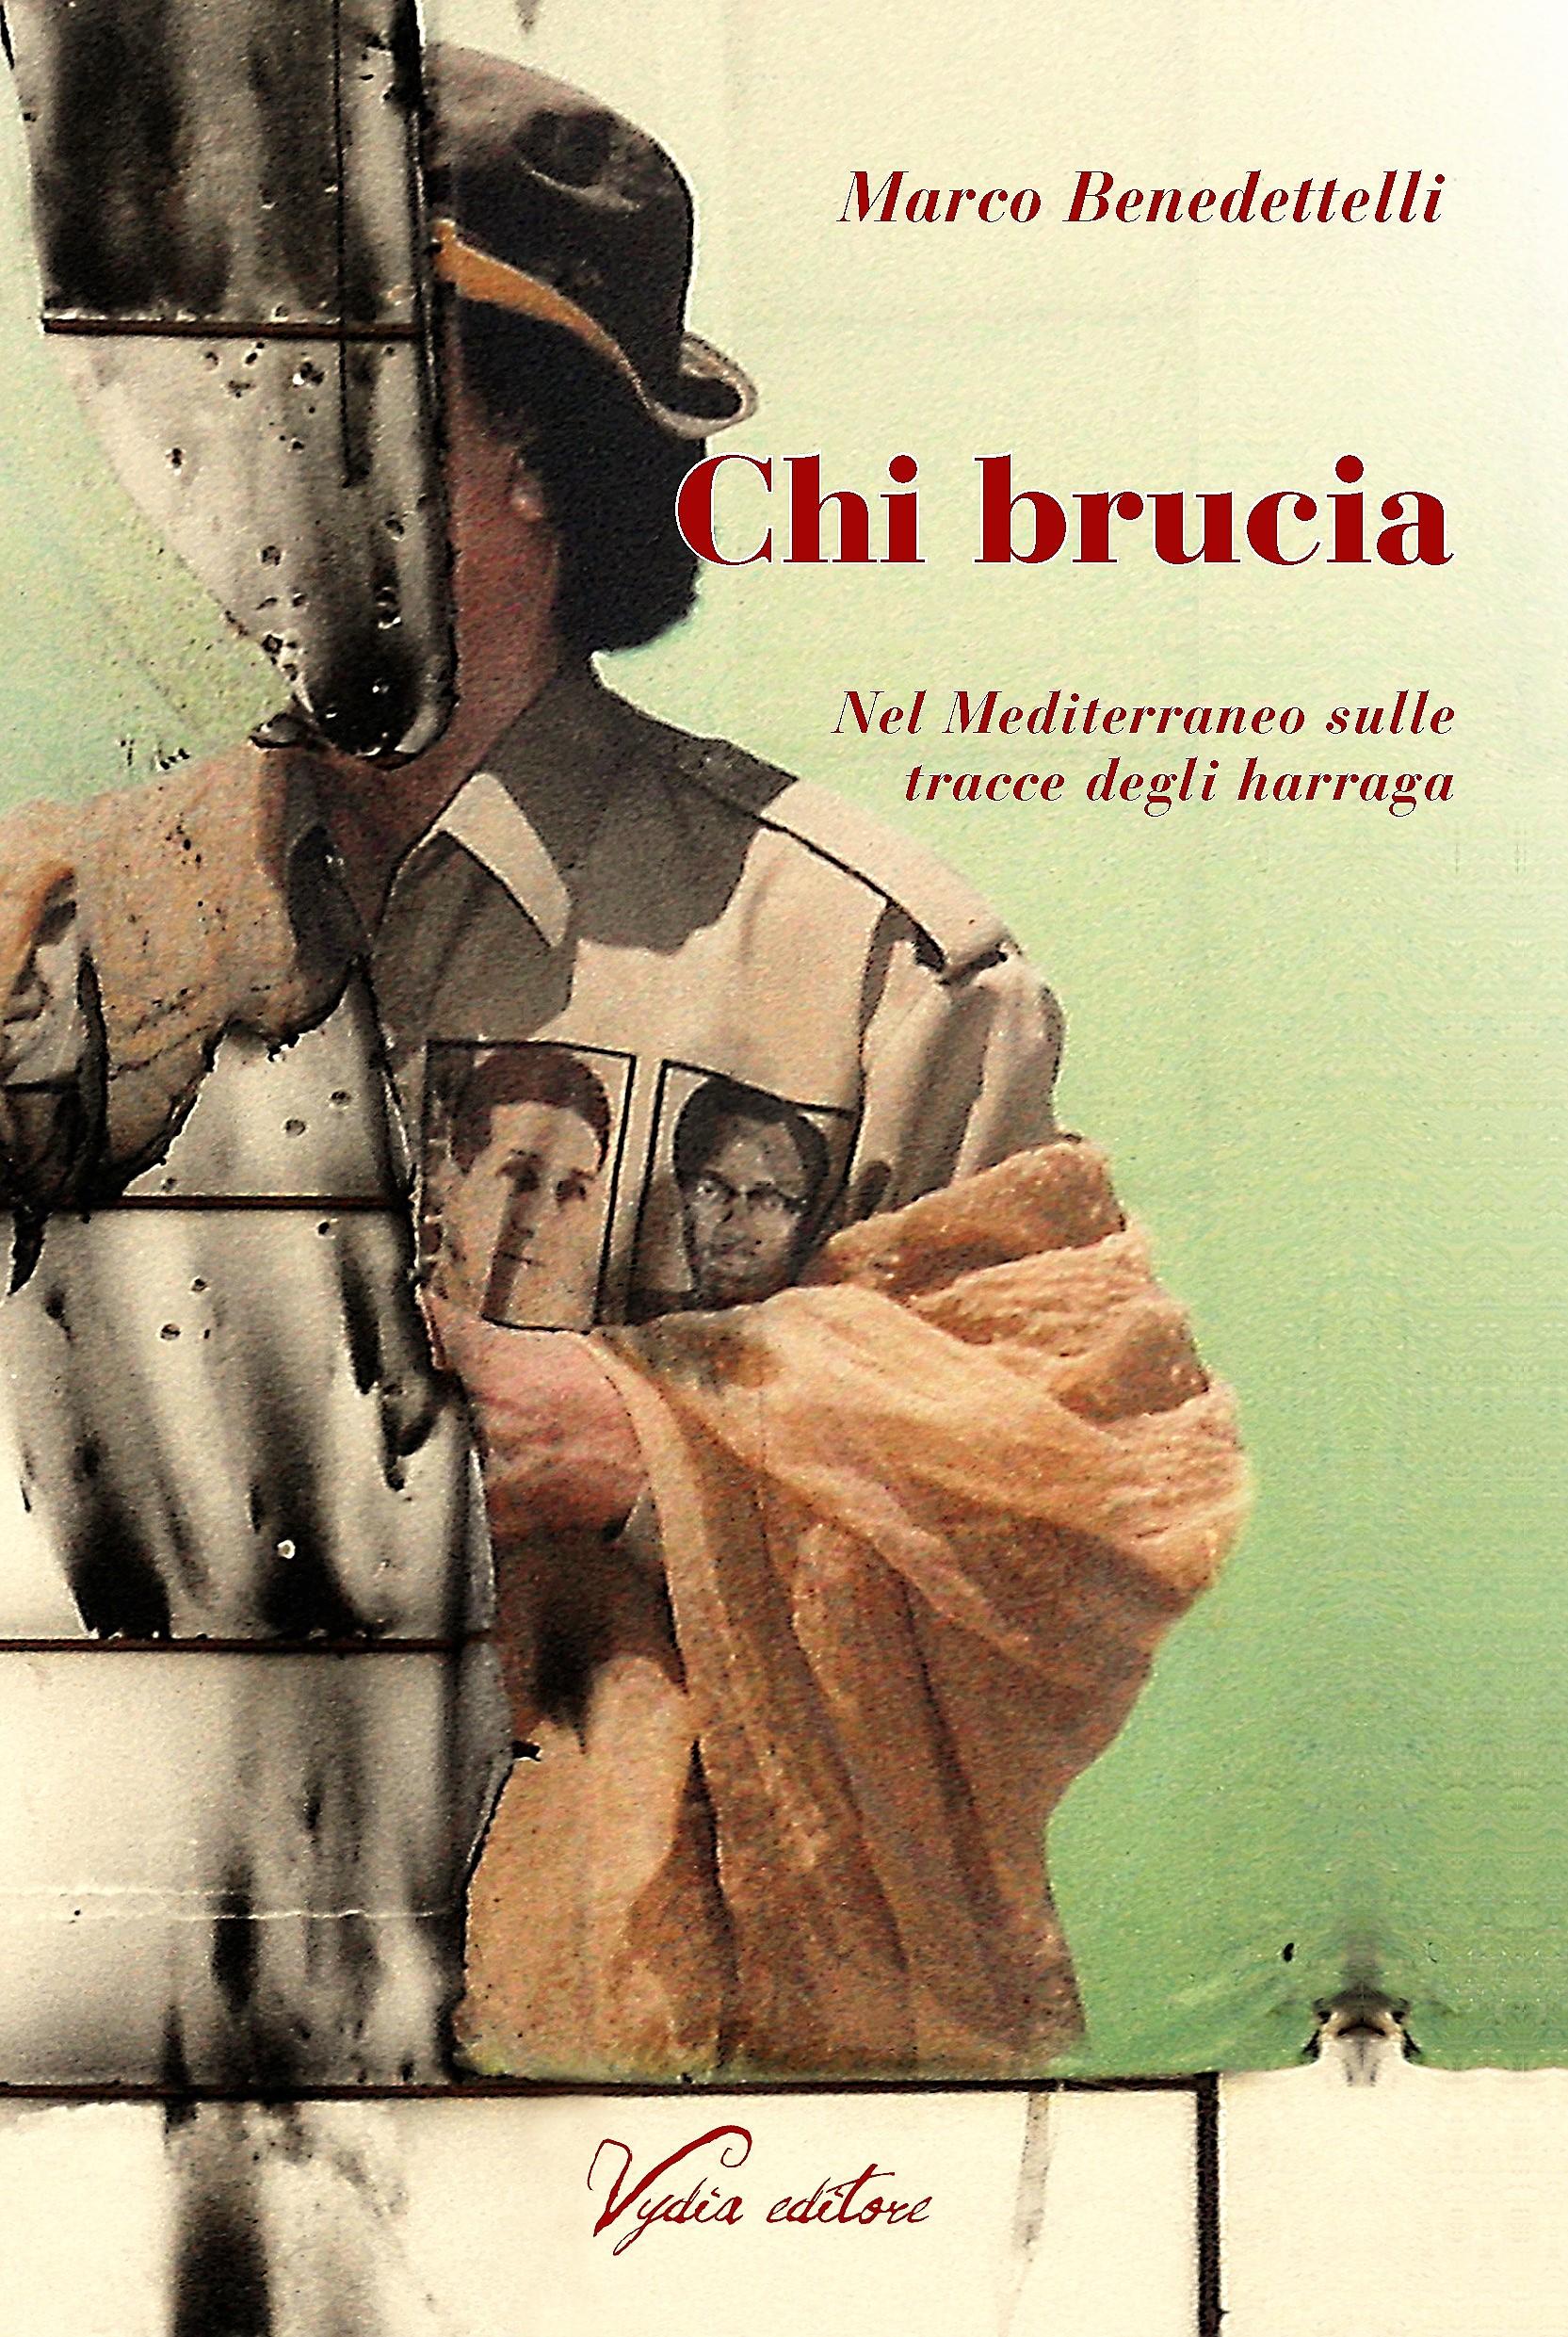 Chi brucia di Marco Benedettelli